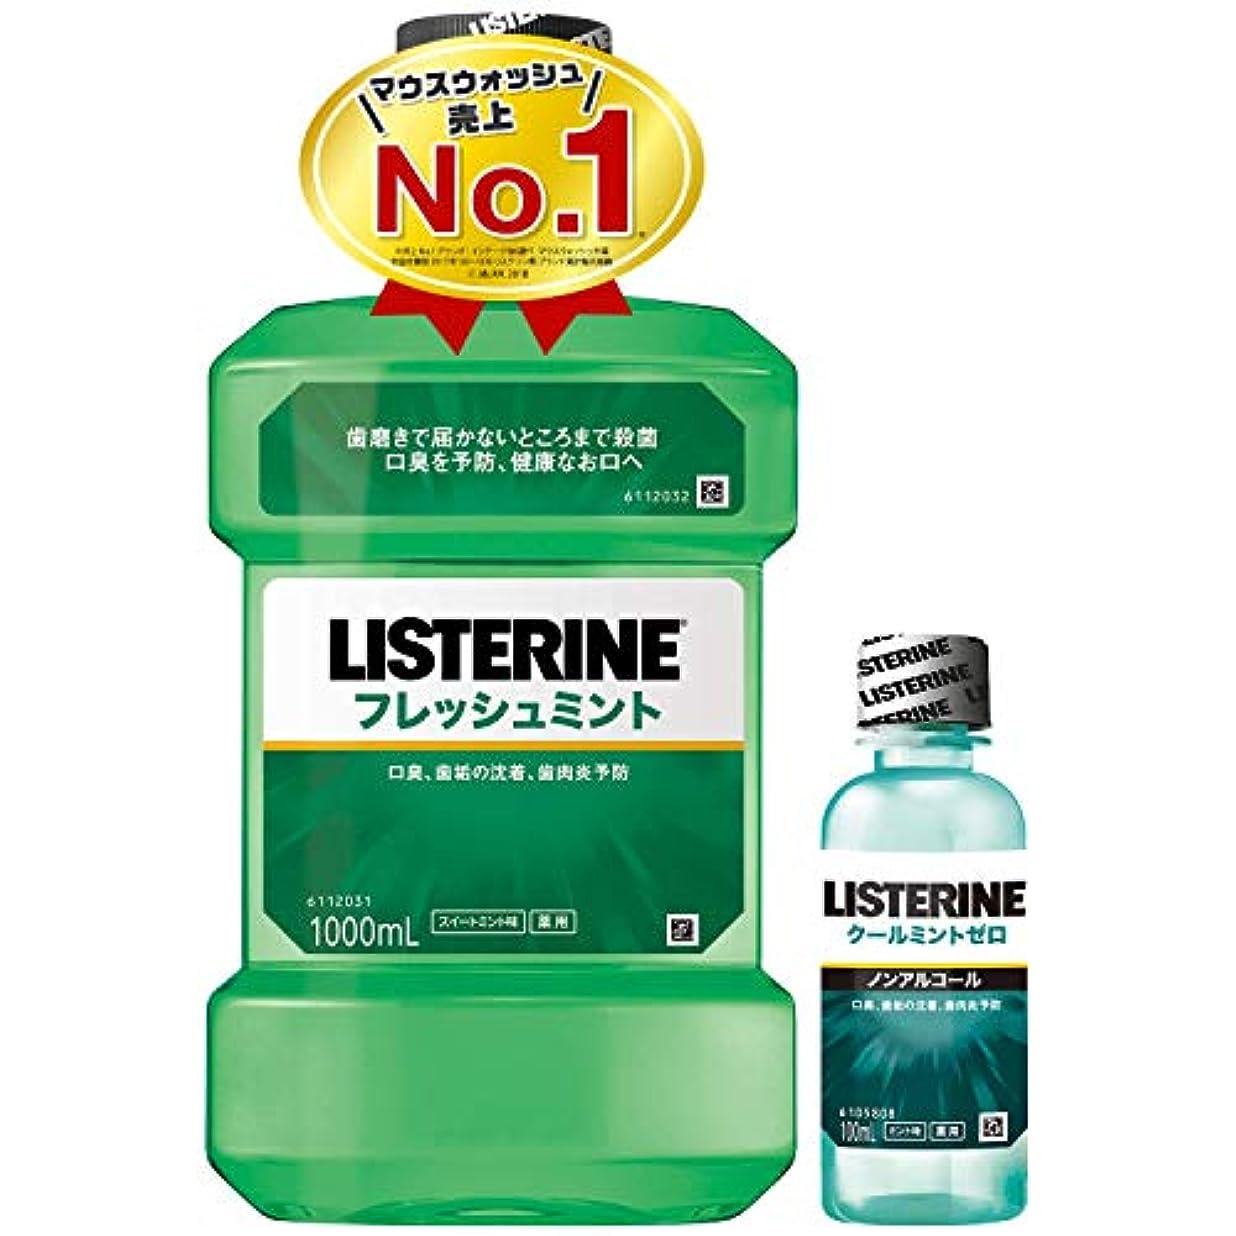 【Amazon.co.jp限定】 LISTERINE(リステリン) [医薬部外品] 薬用 リステリン フレッシュミント マウスウォッシュ スイートミント味 単品 1000mL+おまけつき